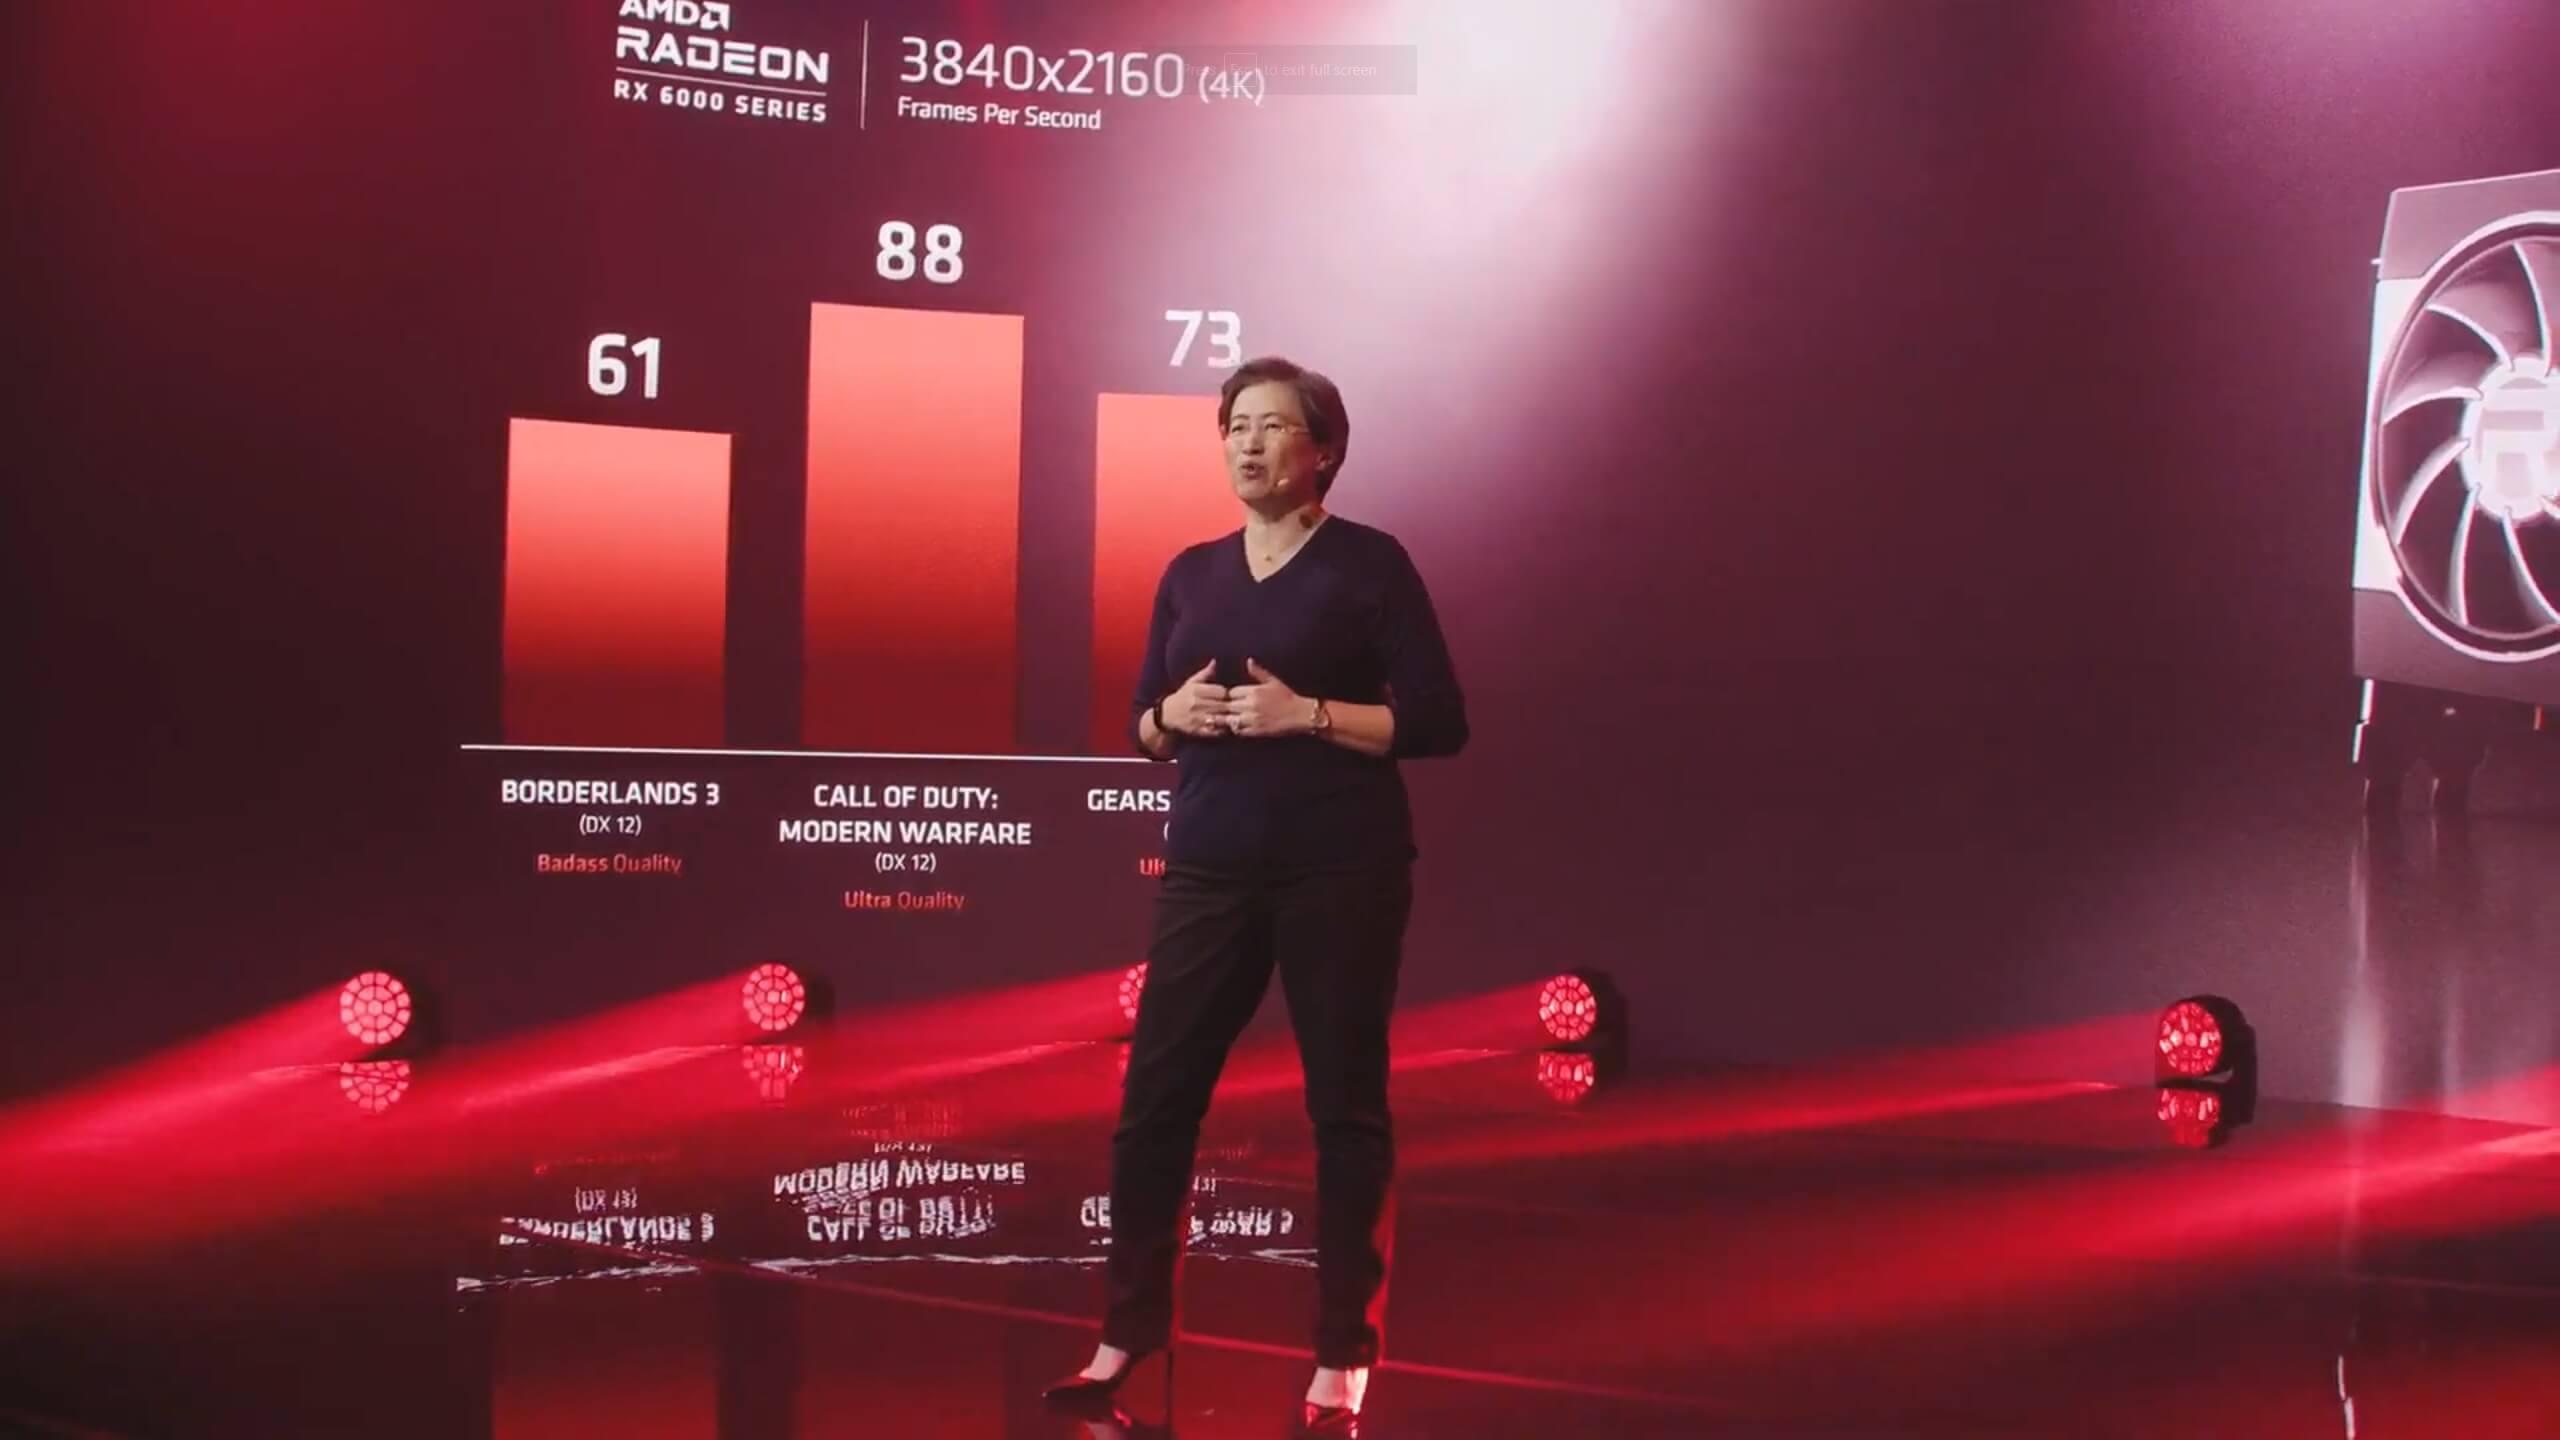 AMD Radeon Big Navi first benchmarks